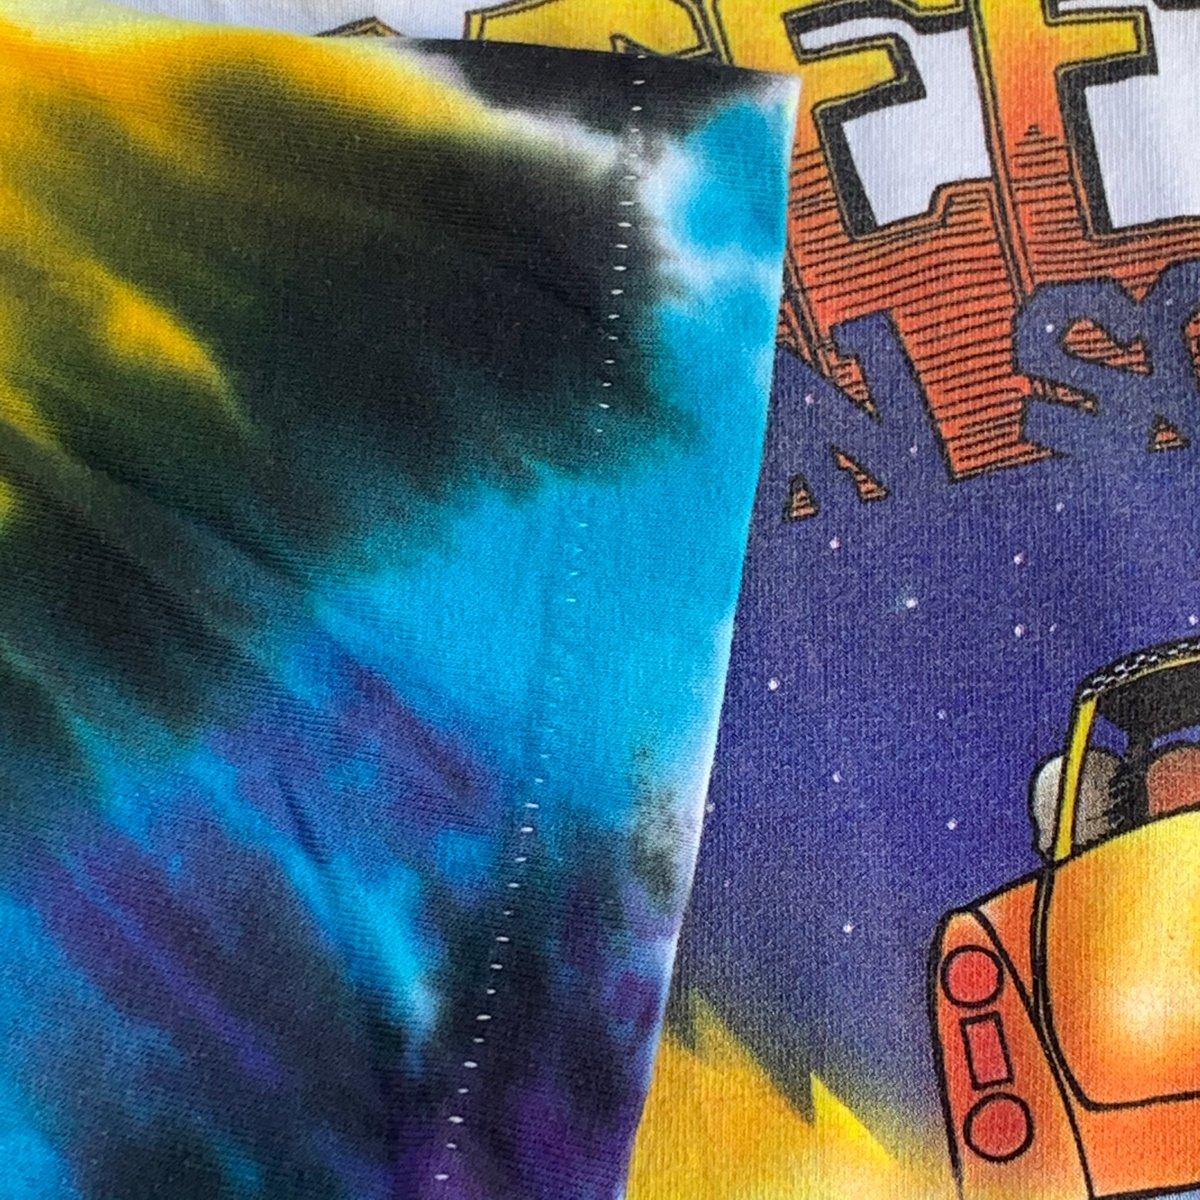 Original Vintage 1990 Grateful Dead Madison Square Garden Dye - X-Large